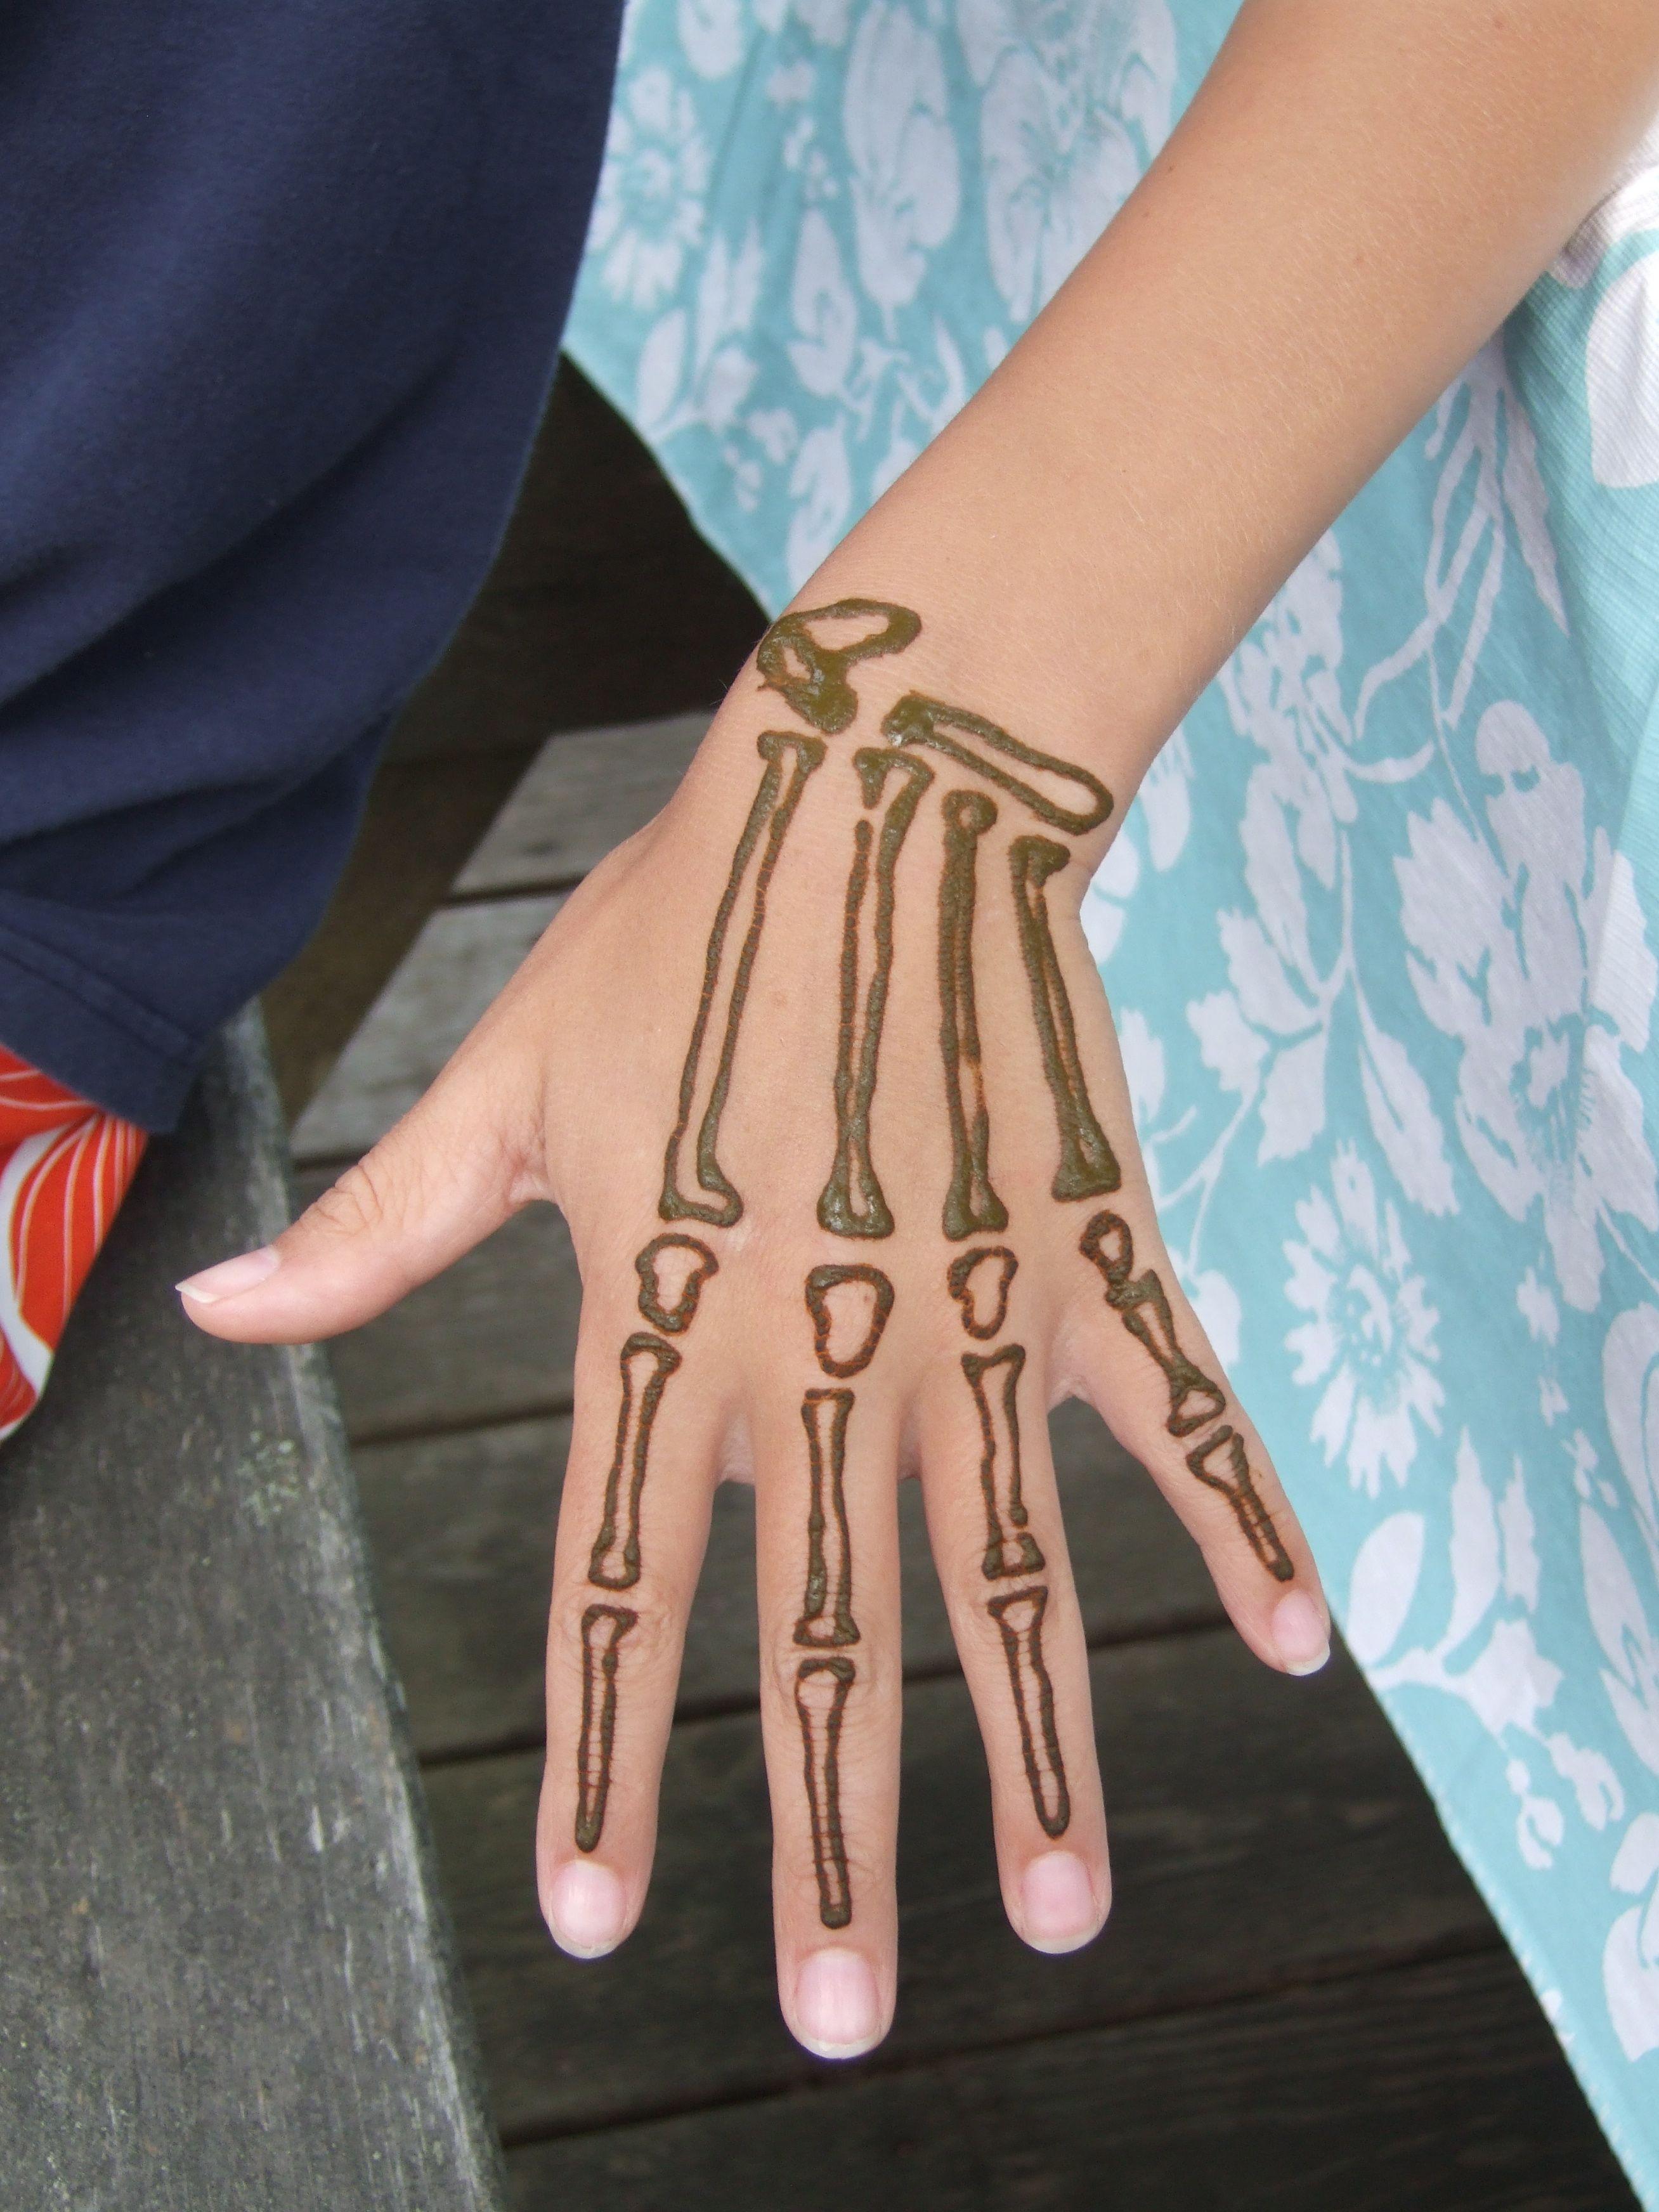 Henna tattoo designs for men - Skeleton Hand Tattoo On Hand Cool Skeleton Hand Tattoos